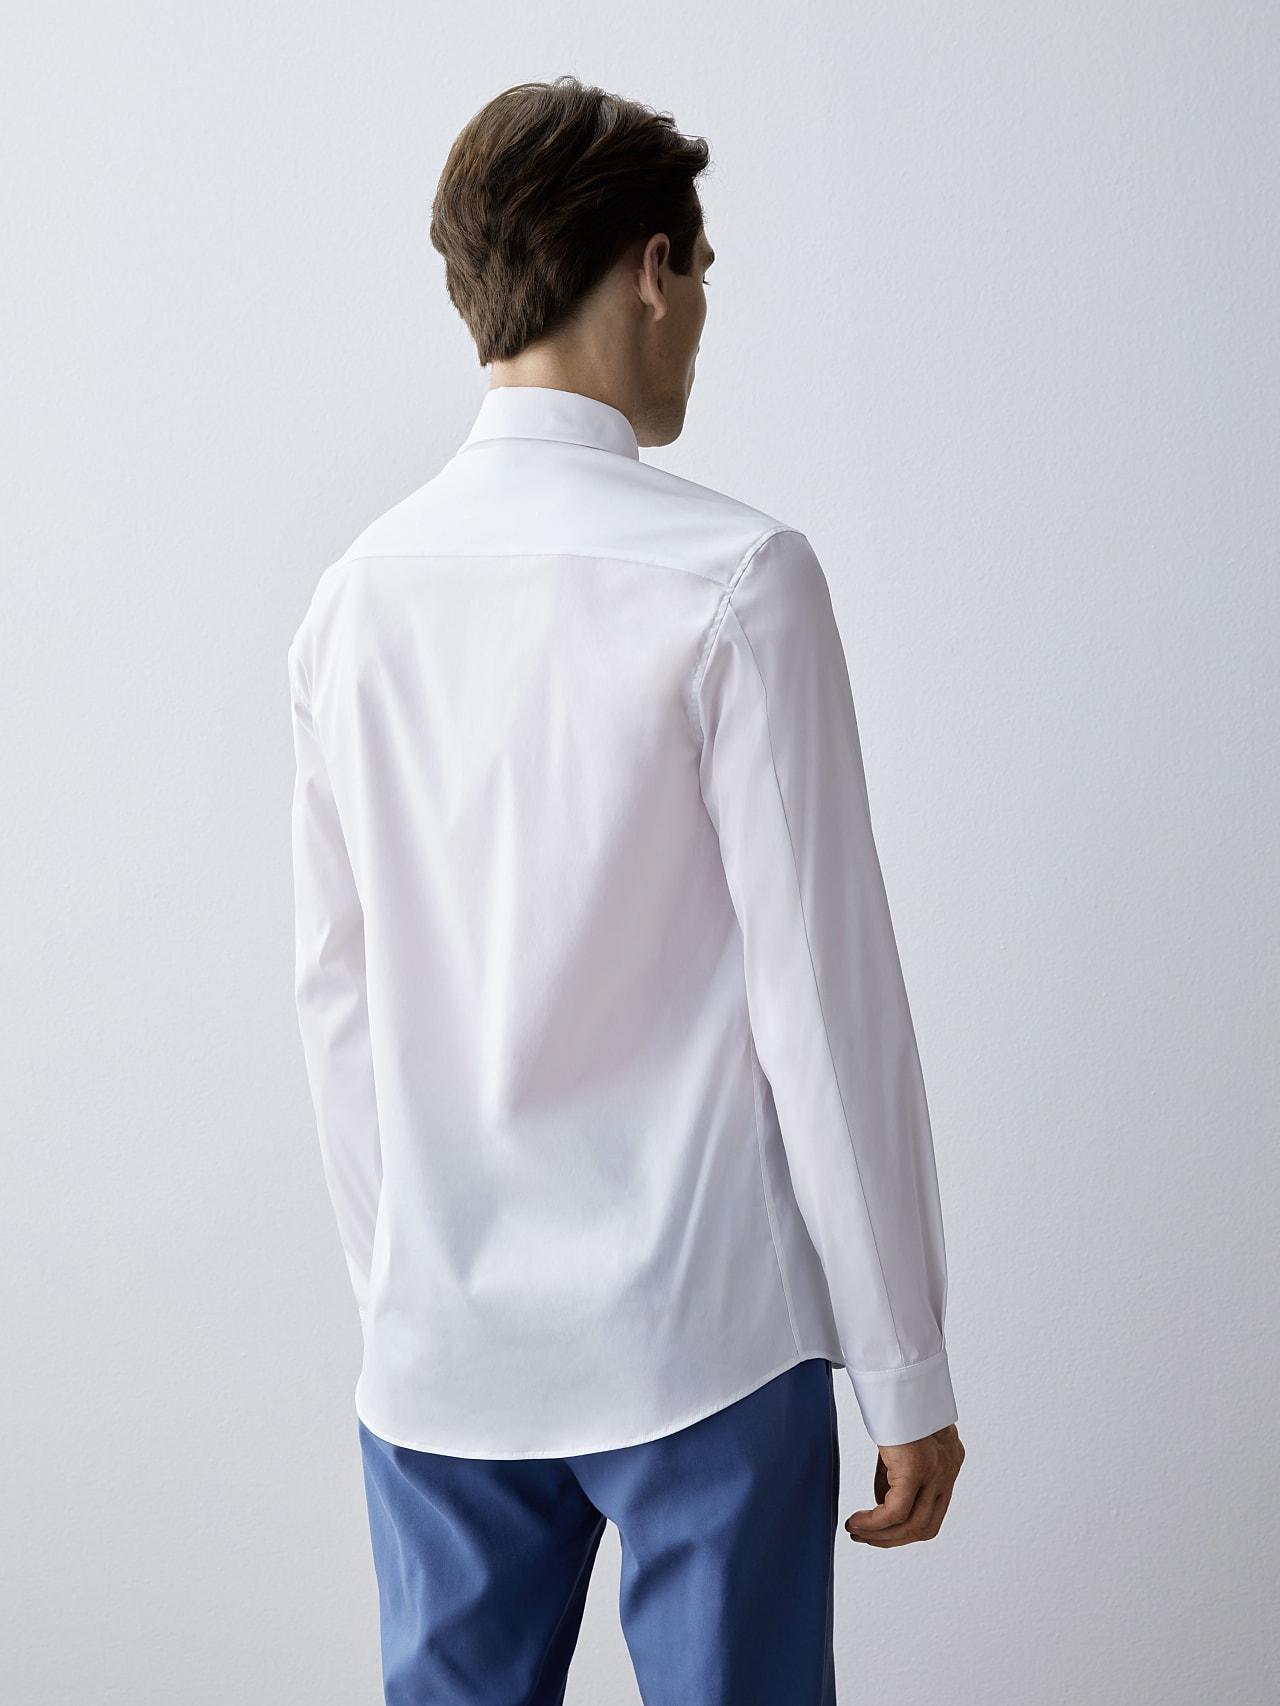 WAMNE V1.Y5.02 Easy-Care Shirt white Front Main Alpha Tauri